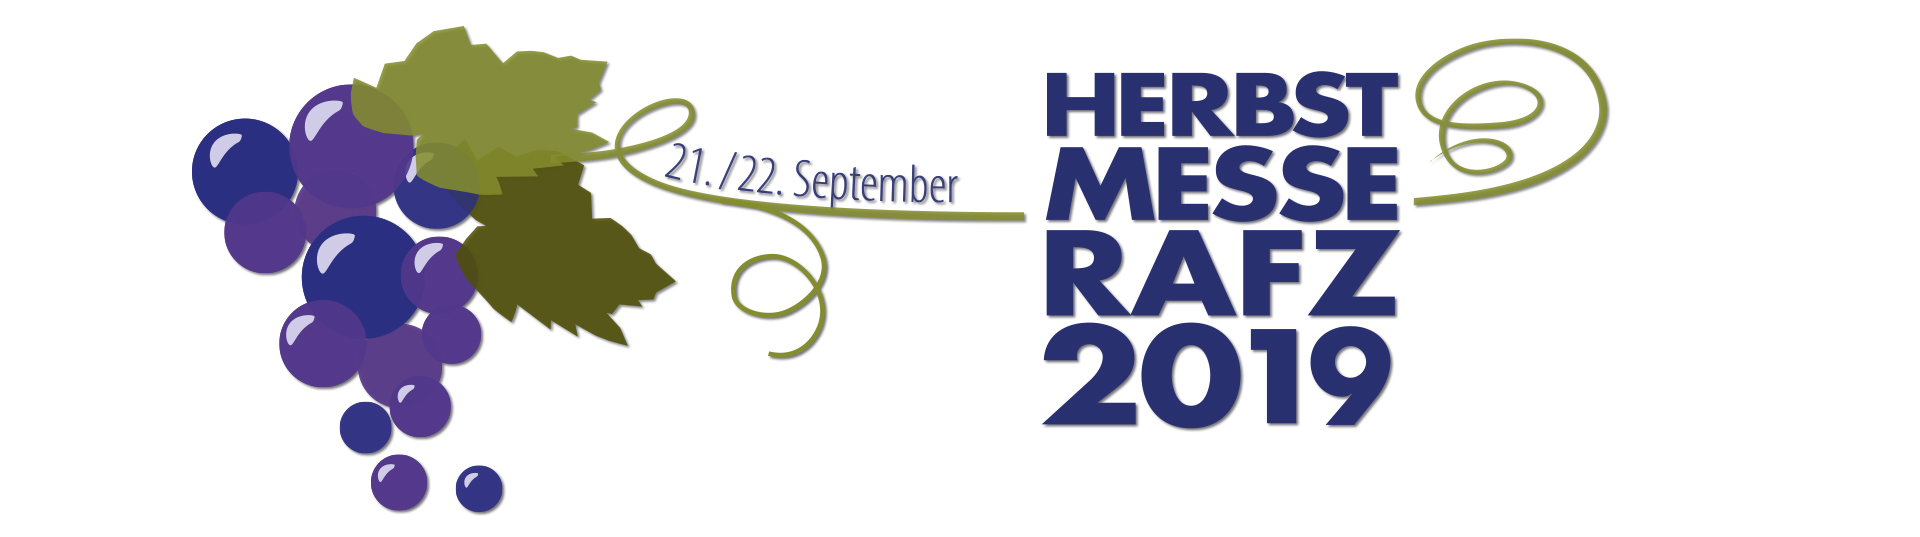 logo_hm_2019jpg